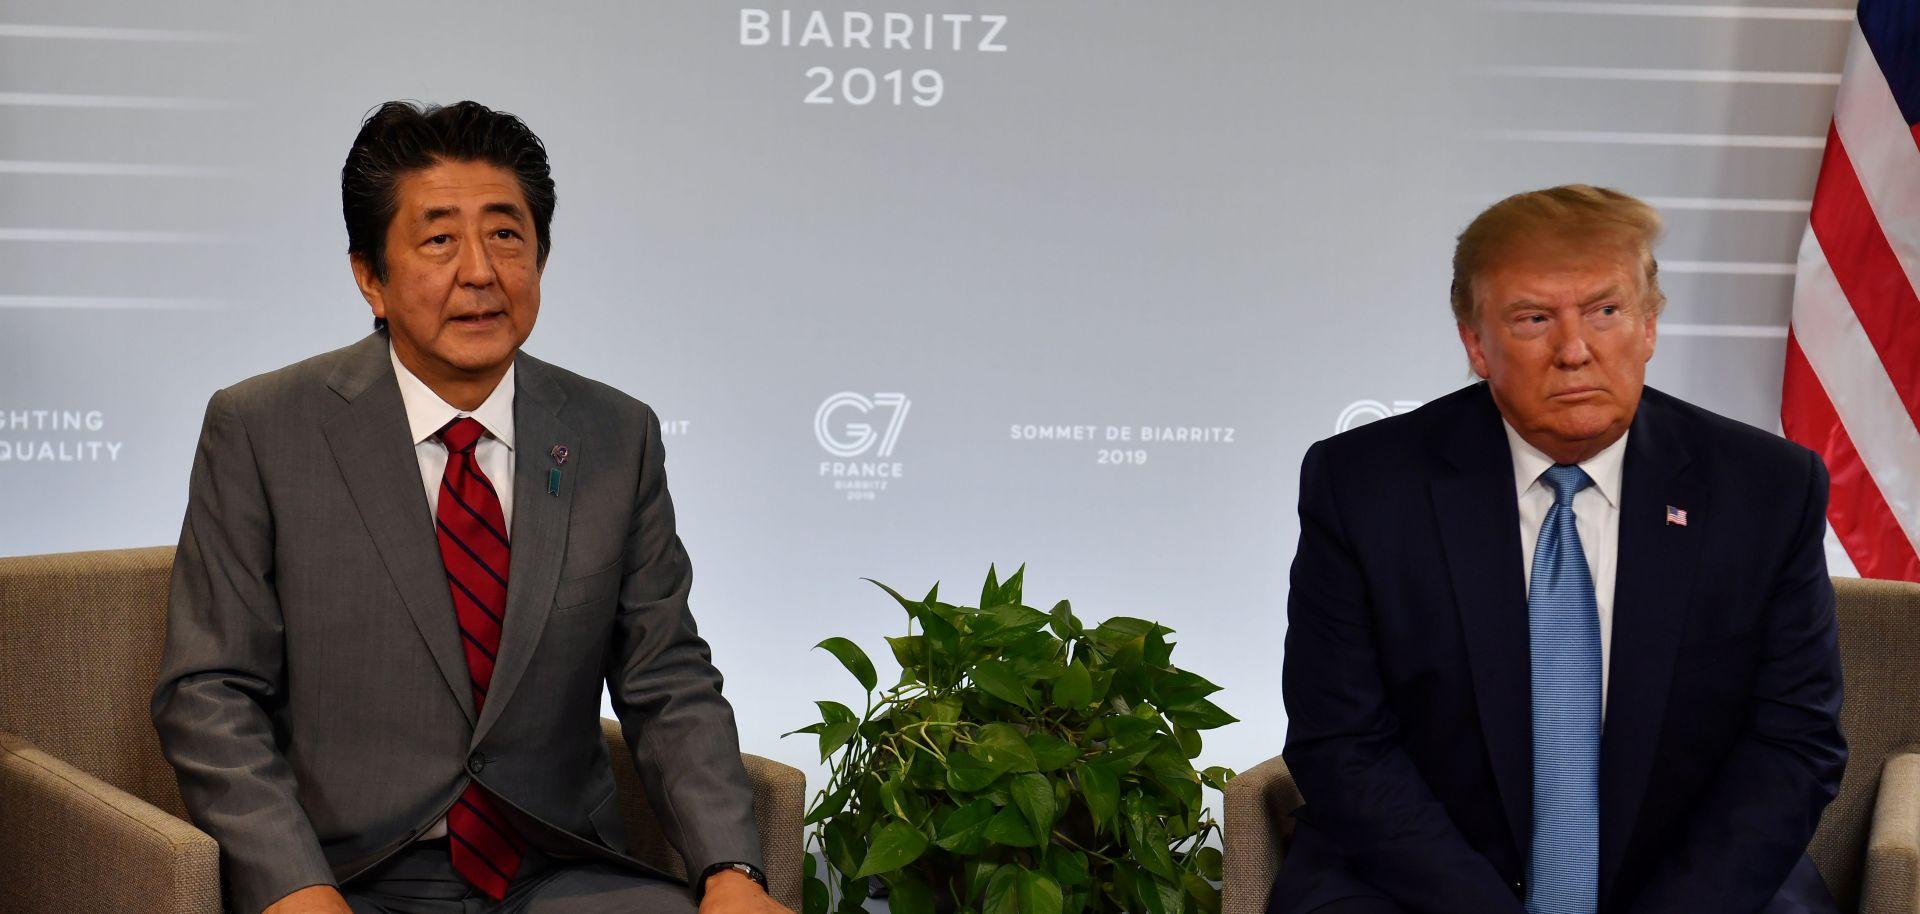 Japan's Prime Minister Shinzo Abe and U.S. President Donald Trump